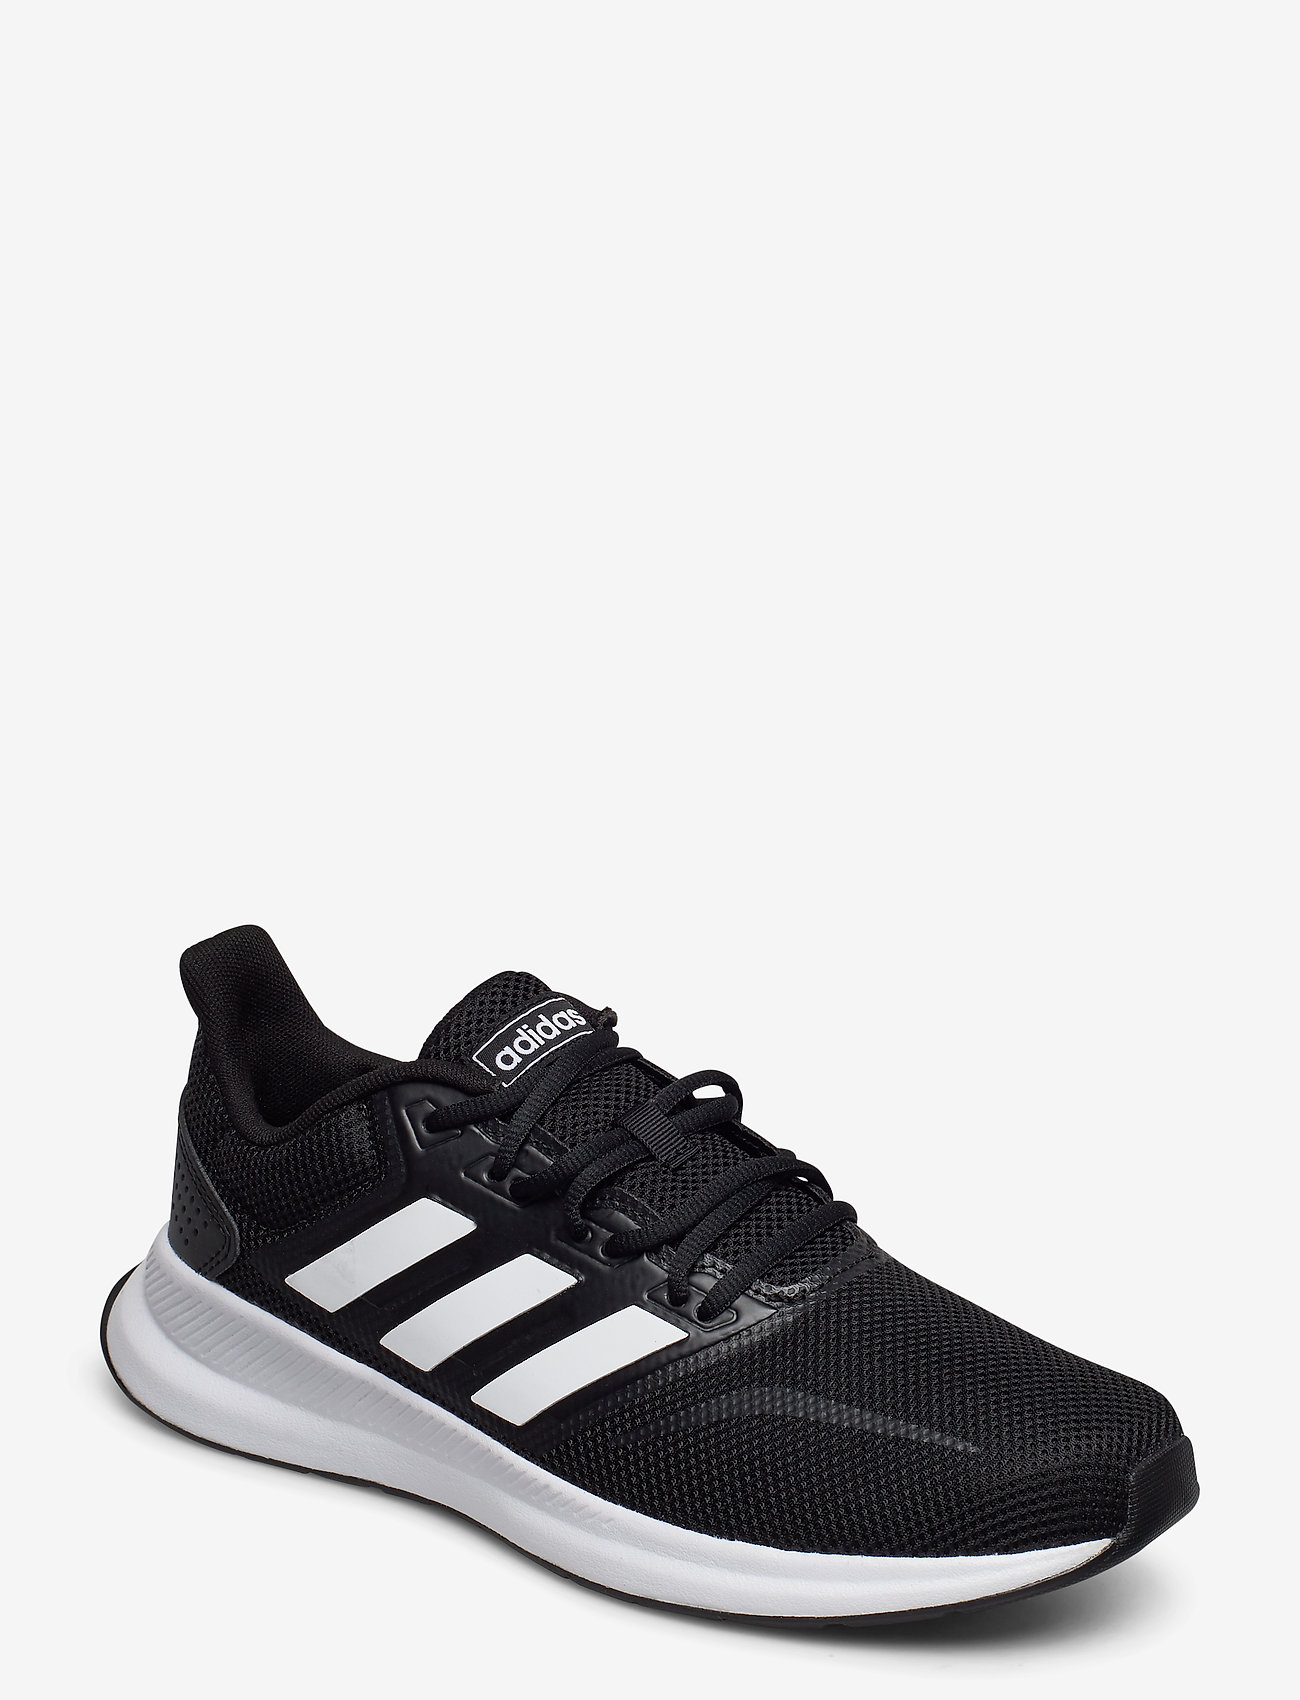 adidas Performance - Runfalcon - löbesko - cblack/ftwwht/cblack - 0